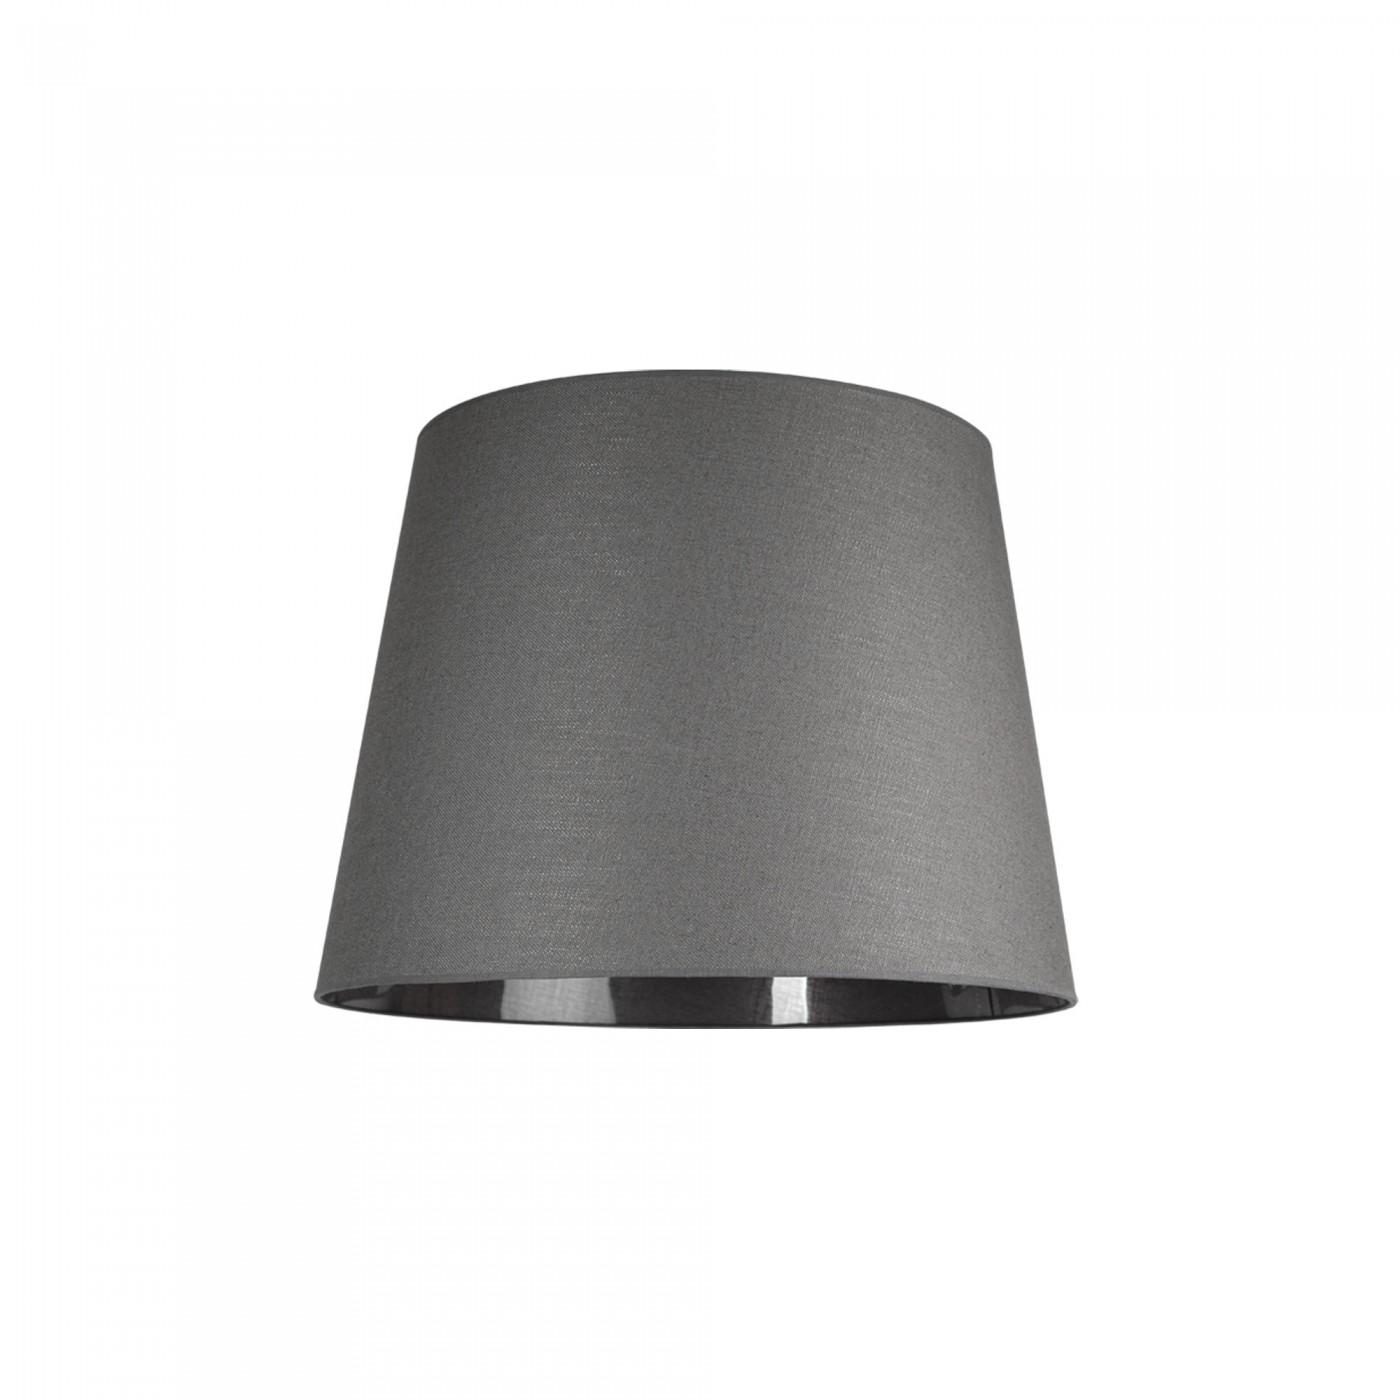 CAMELEON CONE M GY 8412 Nowodvorski Lighting